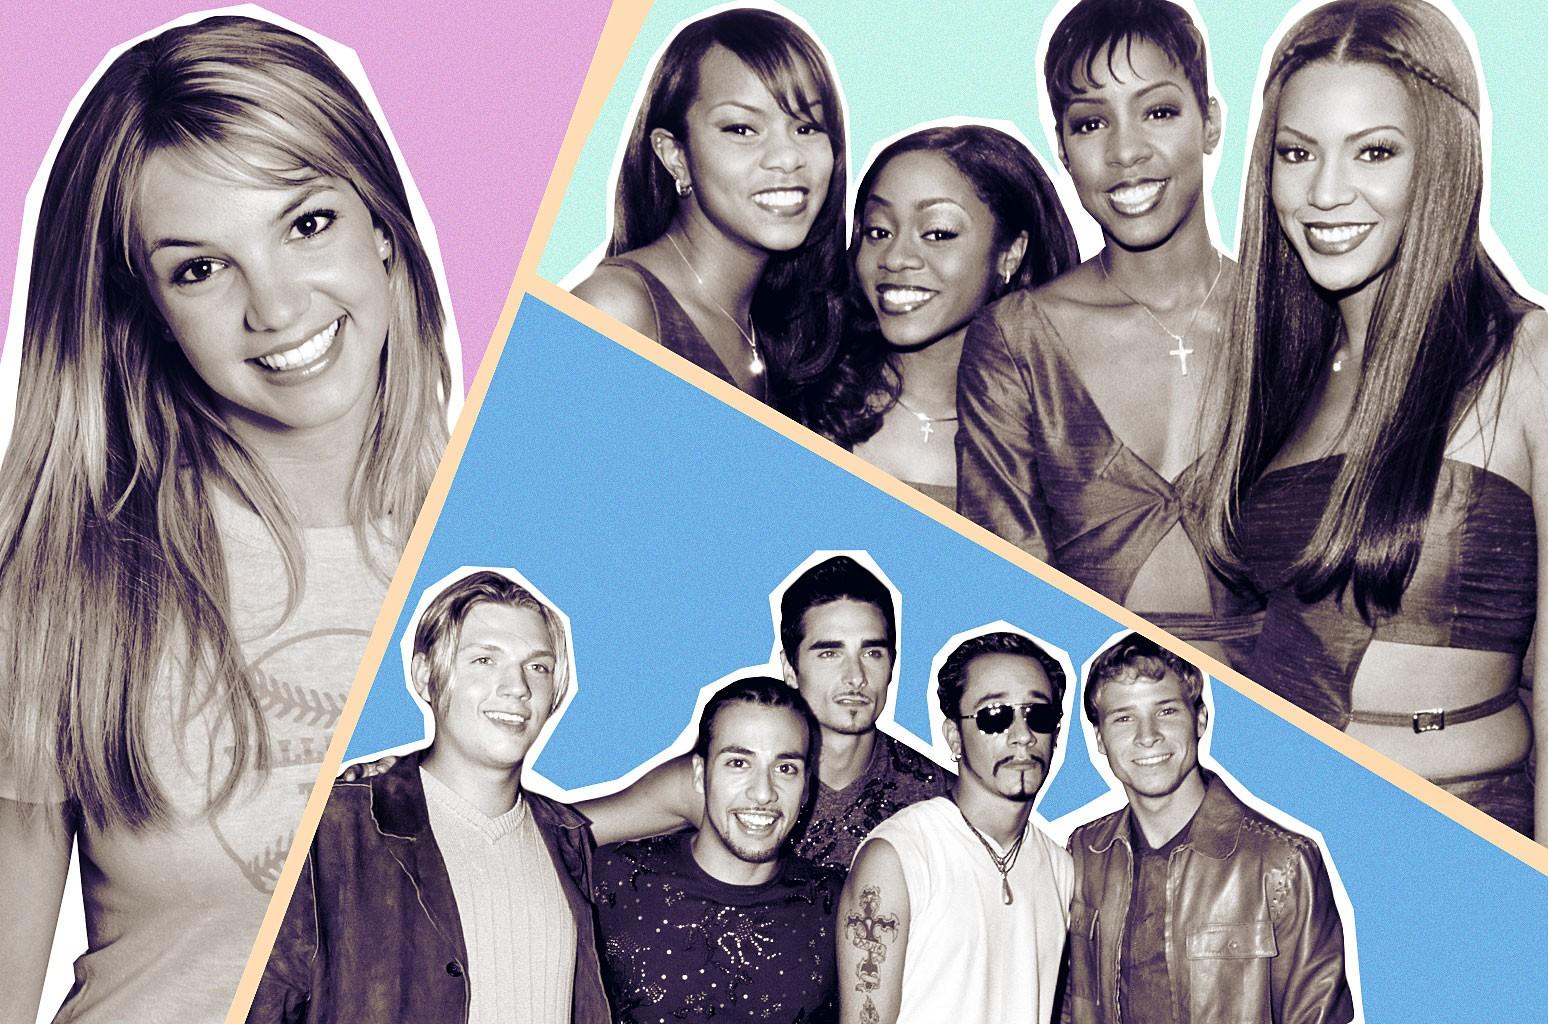 Britney Spears, Destiny's Child and Backstreet Boys